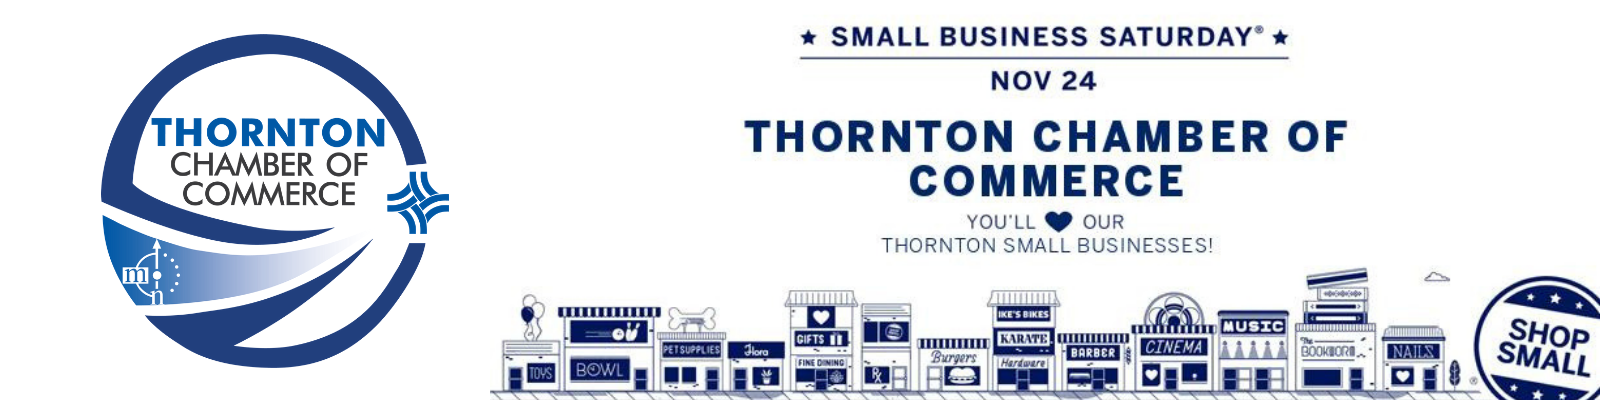 Sm-Biz-Sat-Thornton-2018-Web-banner.png